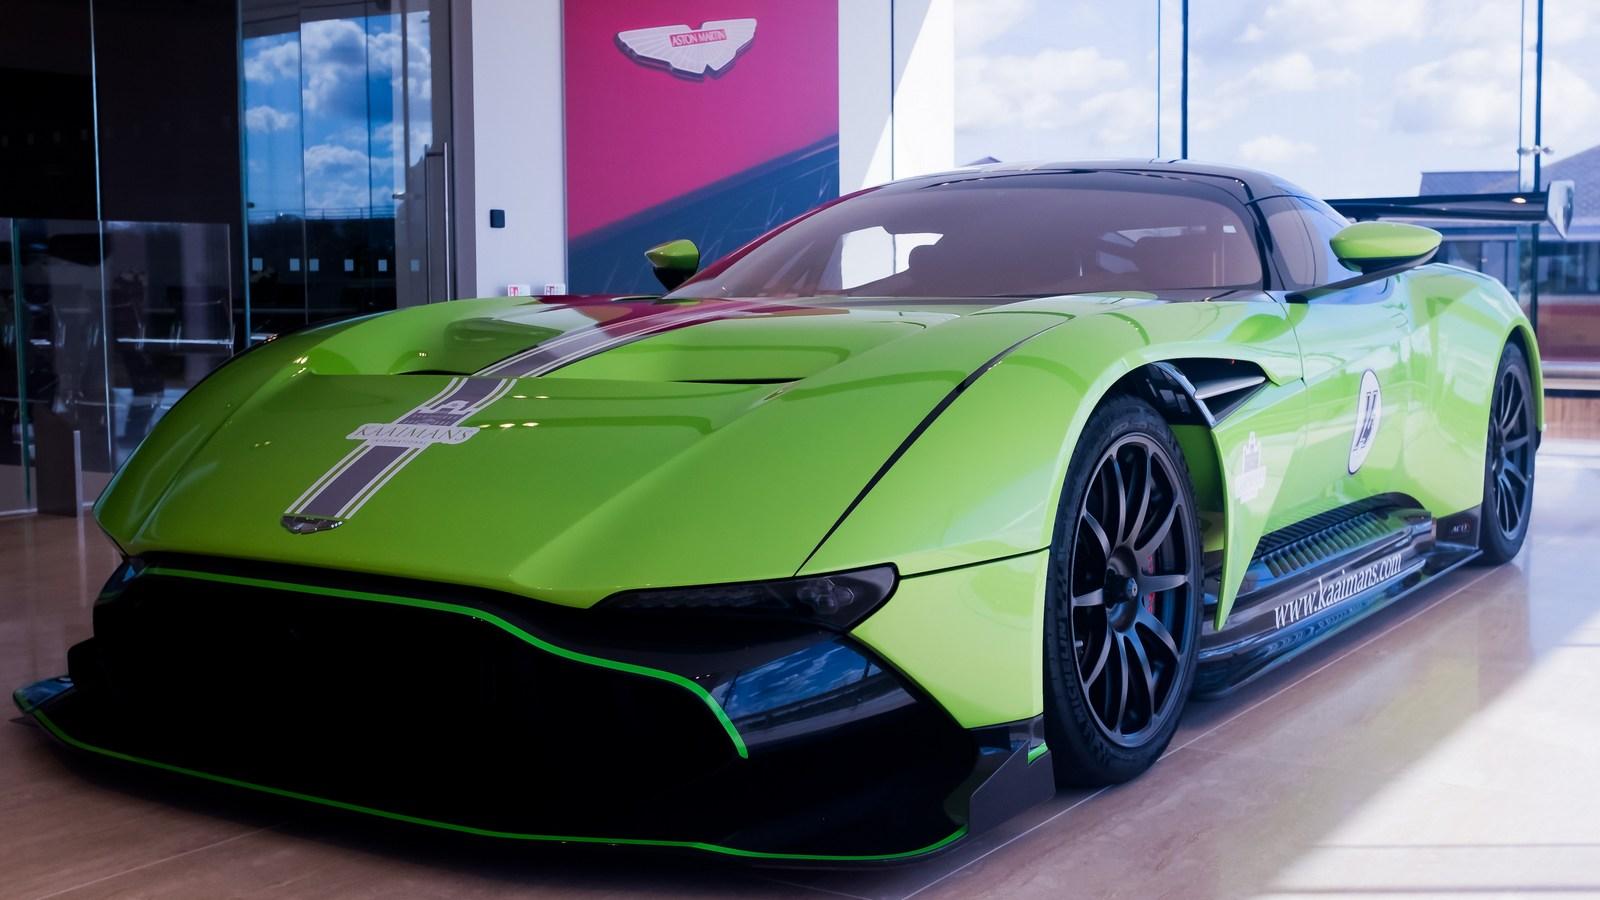 Green Aston Martin Vulcan (2)